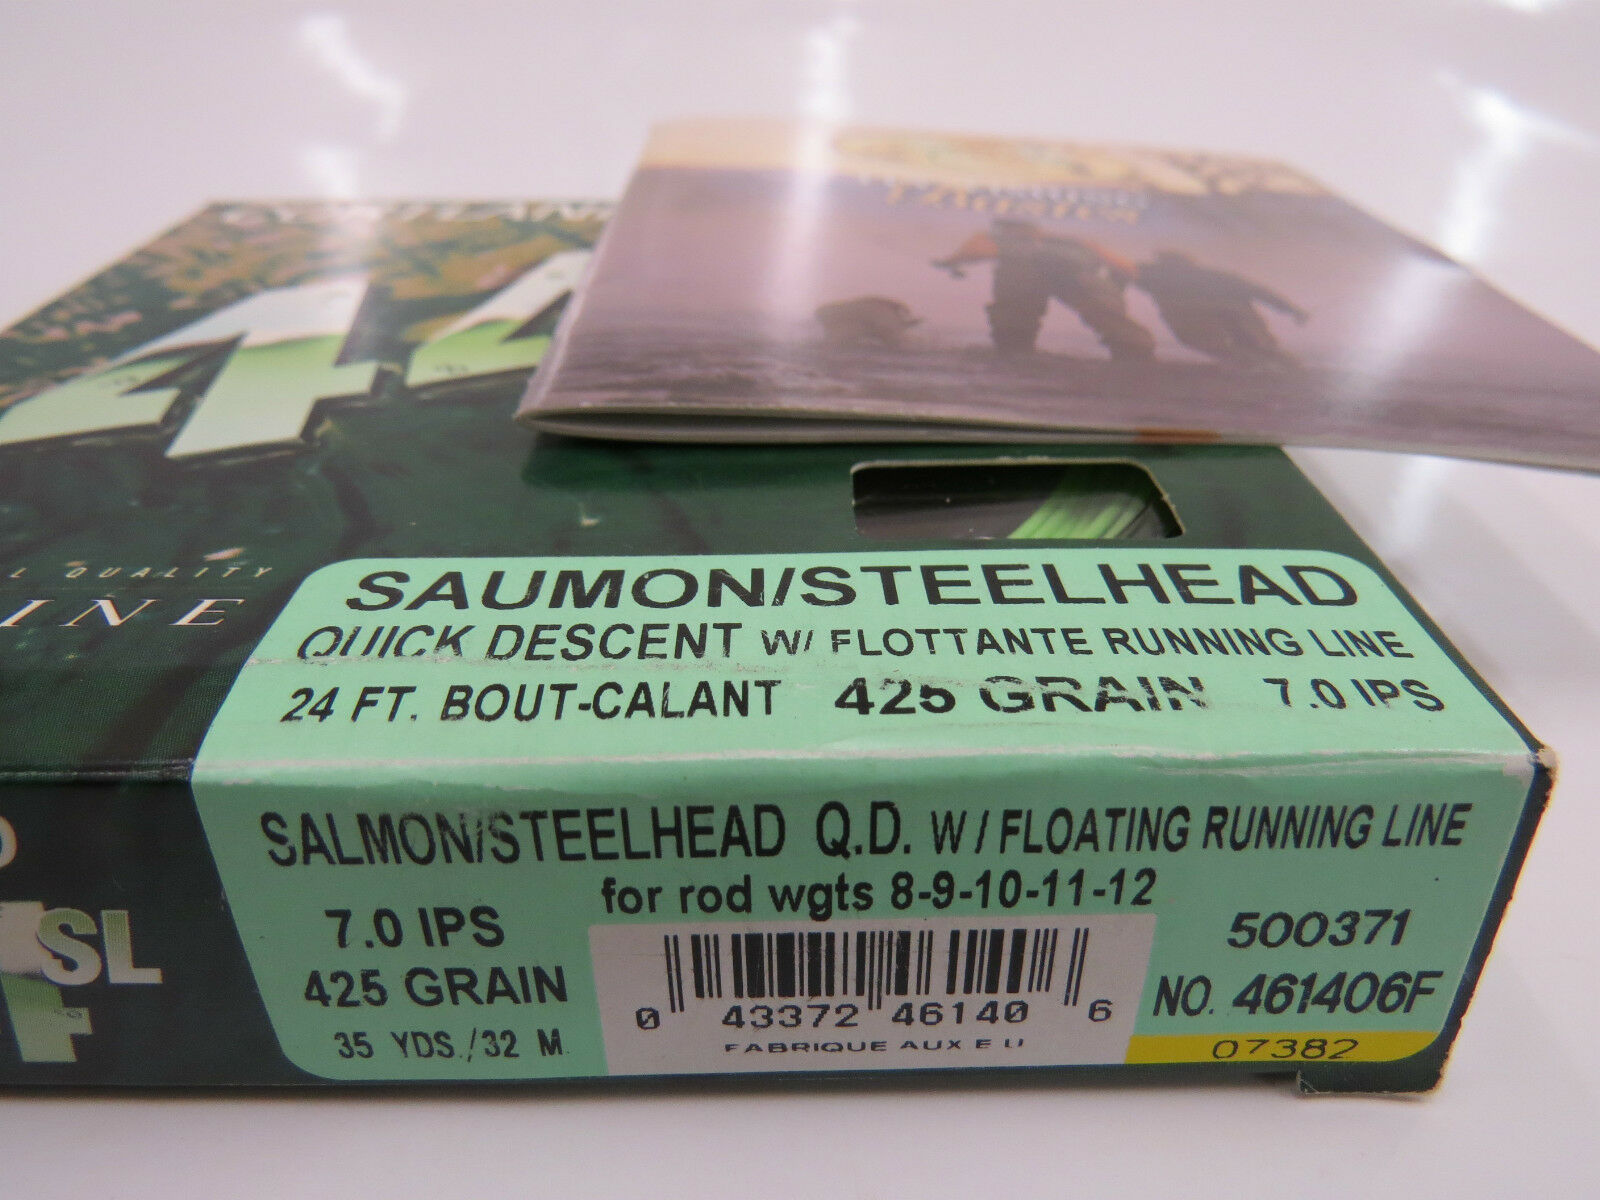 Cortland 444 Salmon Steelhead Floating RUNNING LINE 7.0 IPS 425 grain 35 yds